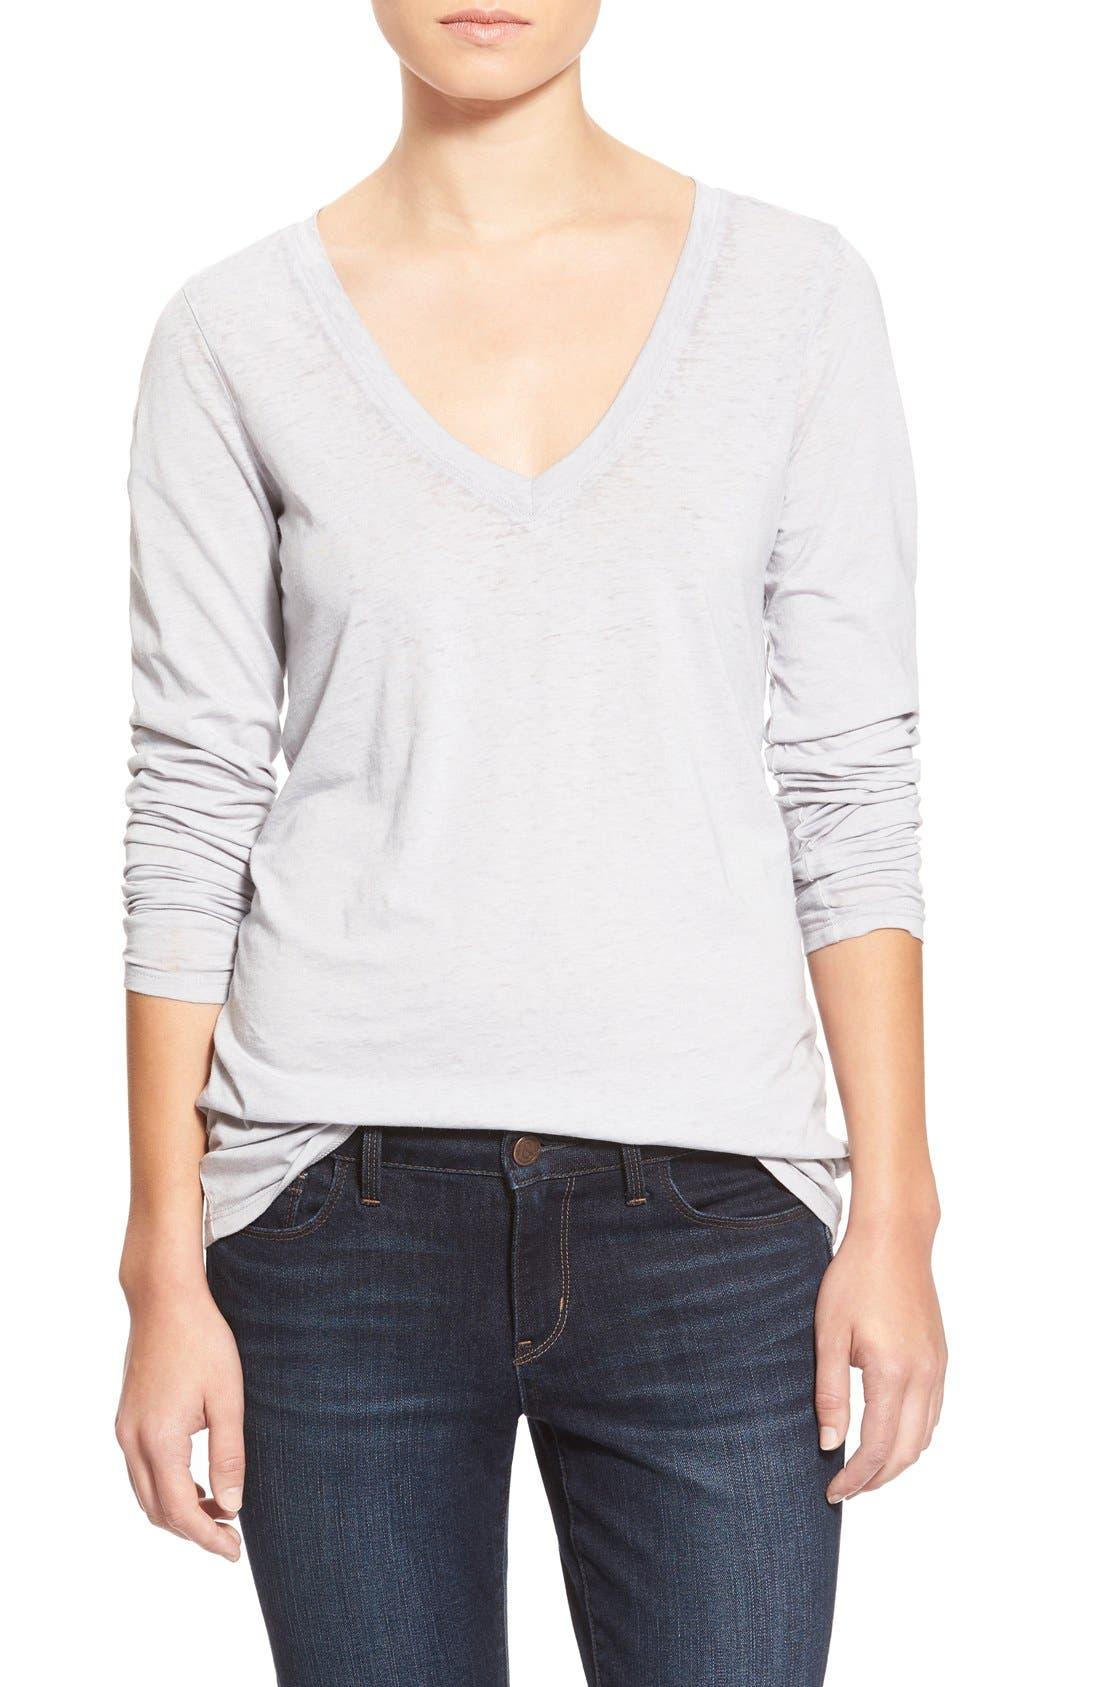 Main Image - Stem Lightweight Long Sleeve V-Neck Tee